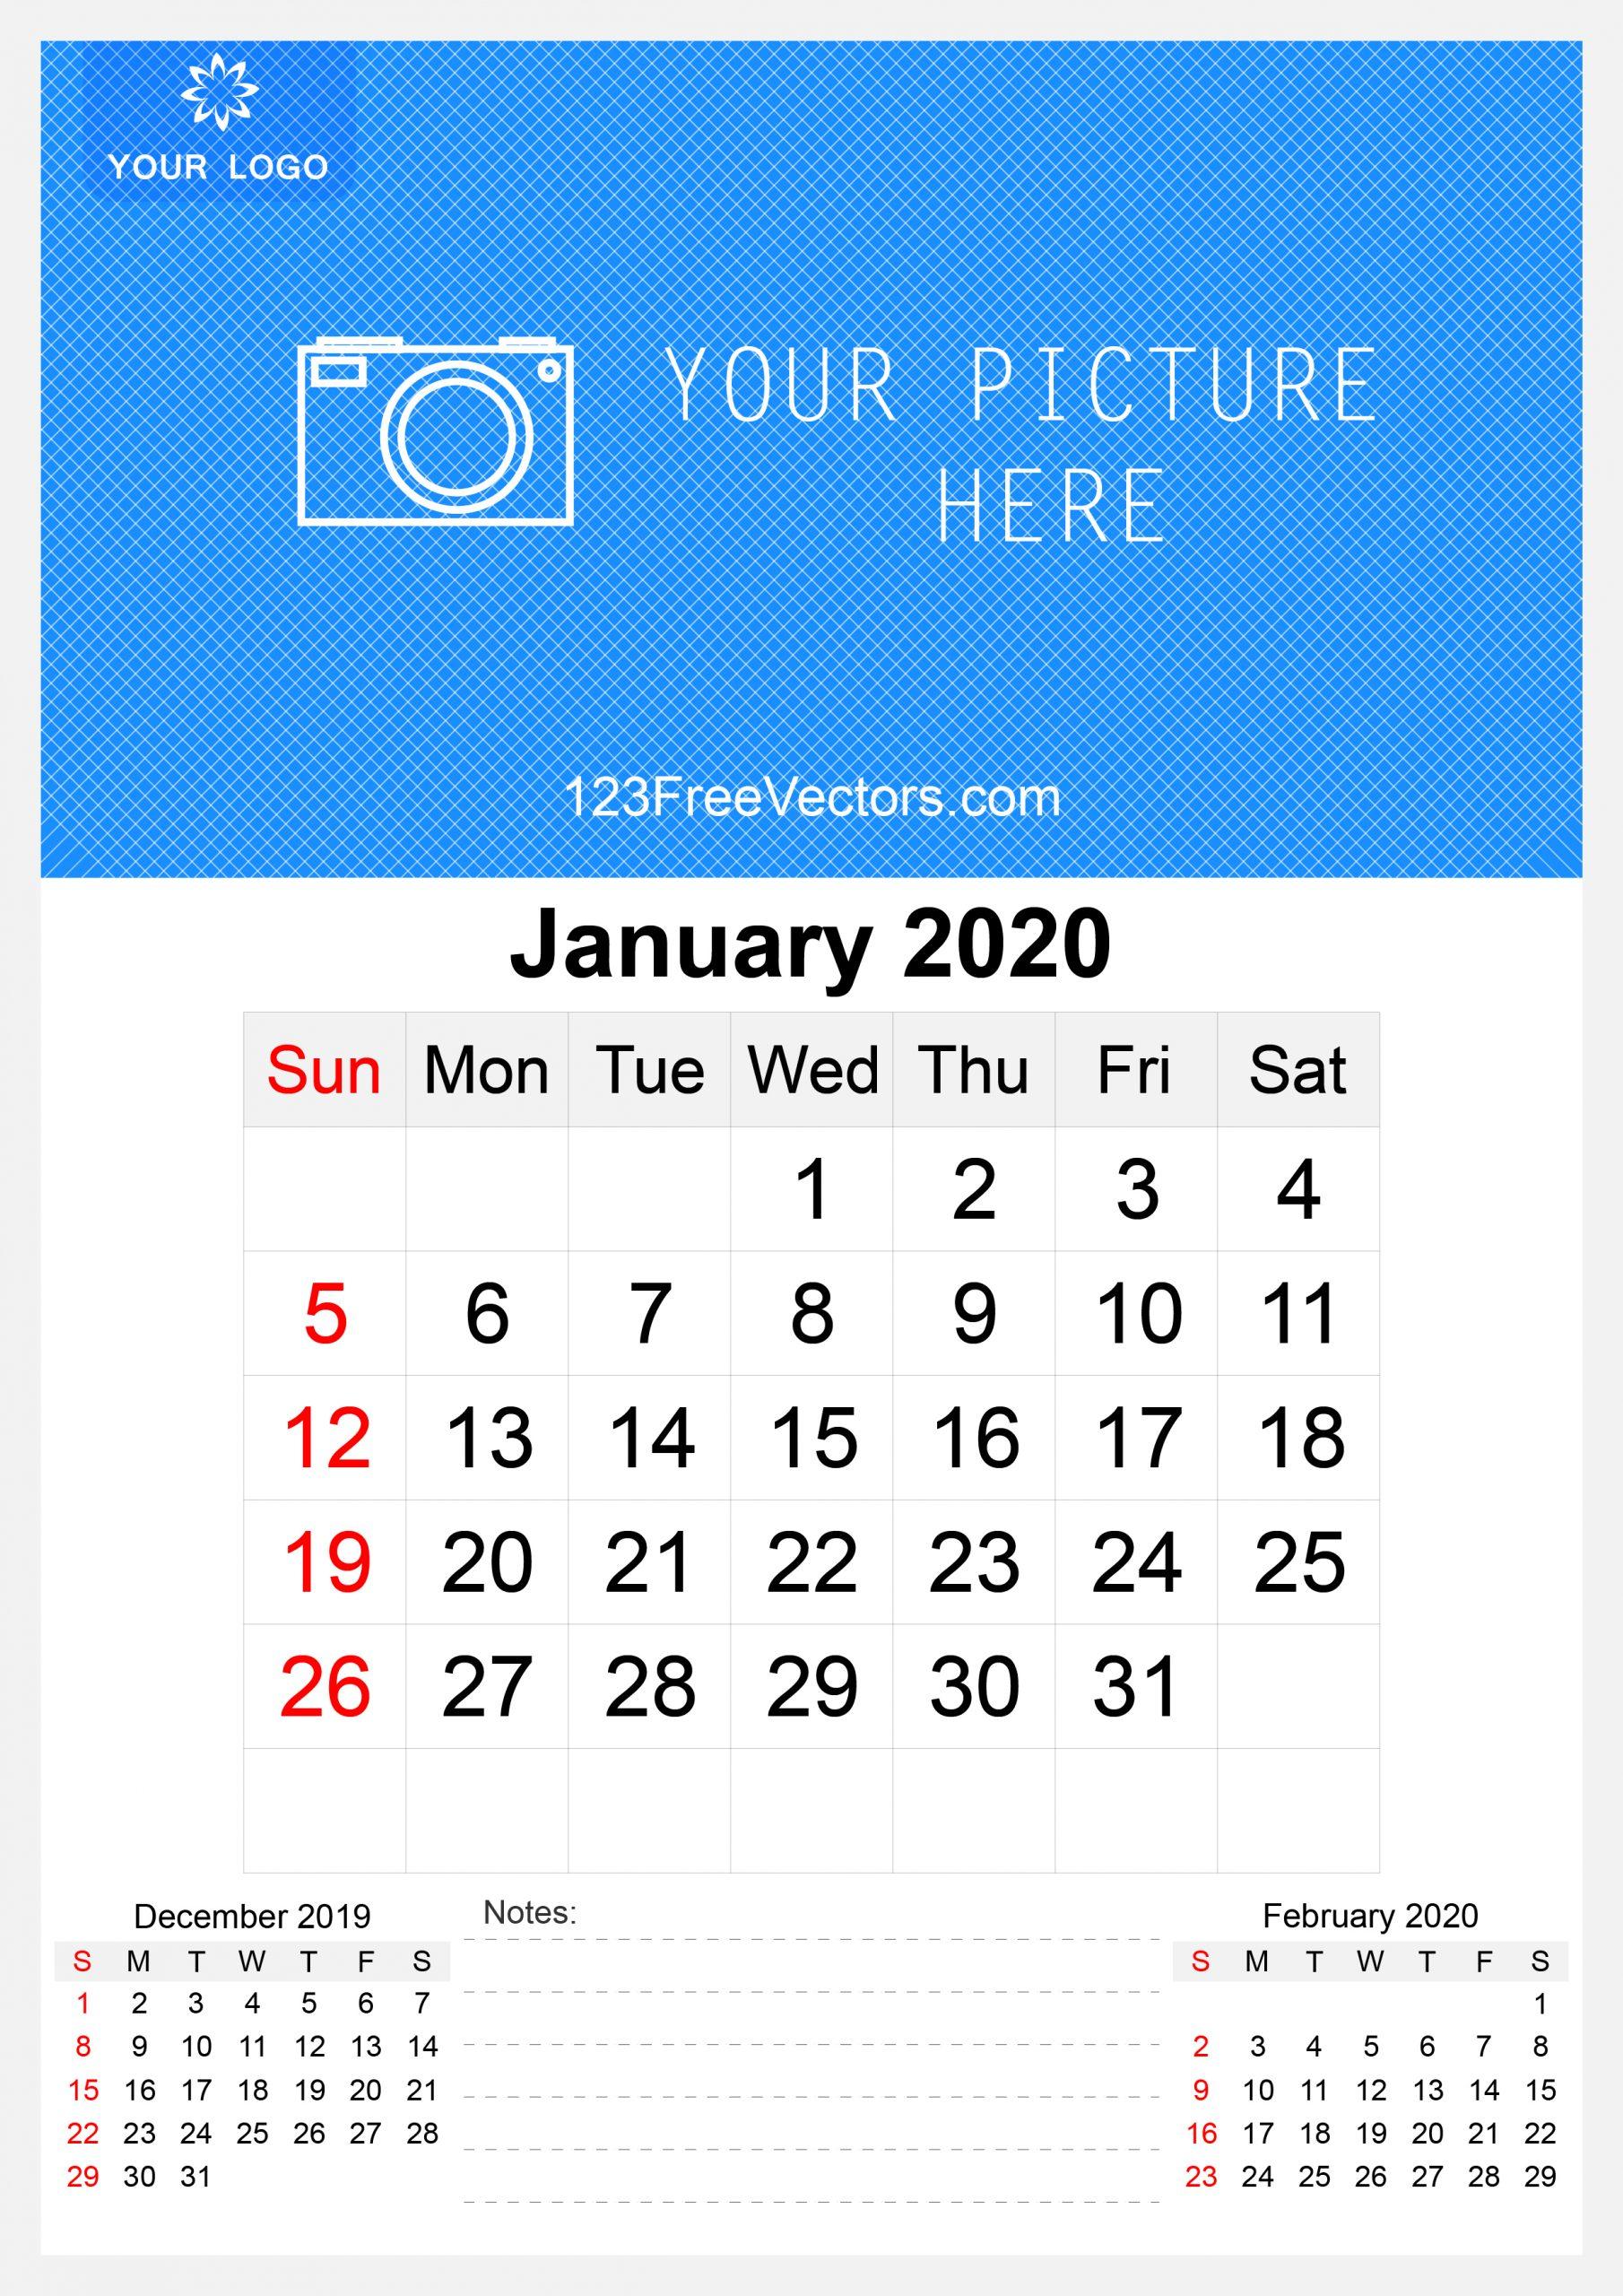 2020 January Wall Calendar Template Free